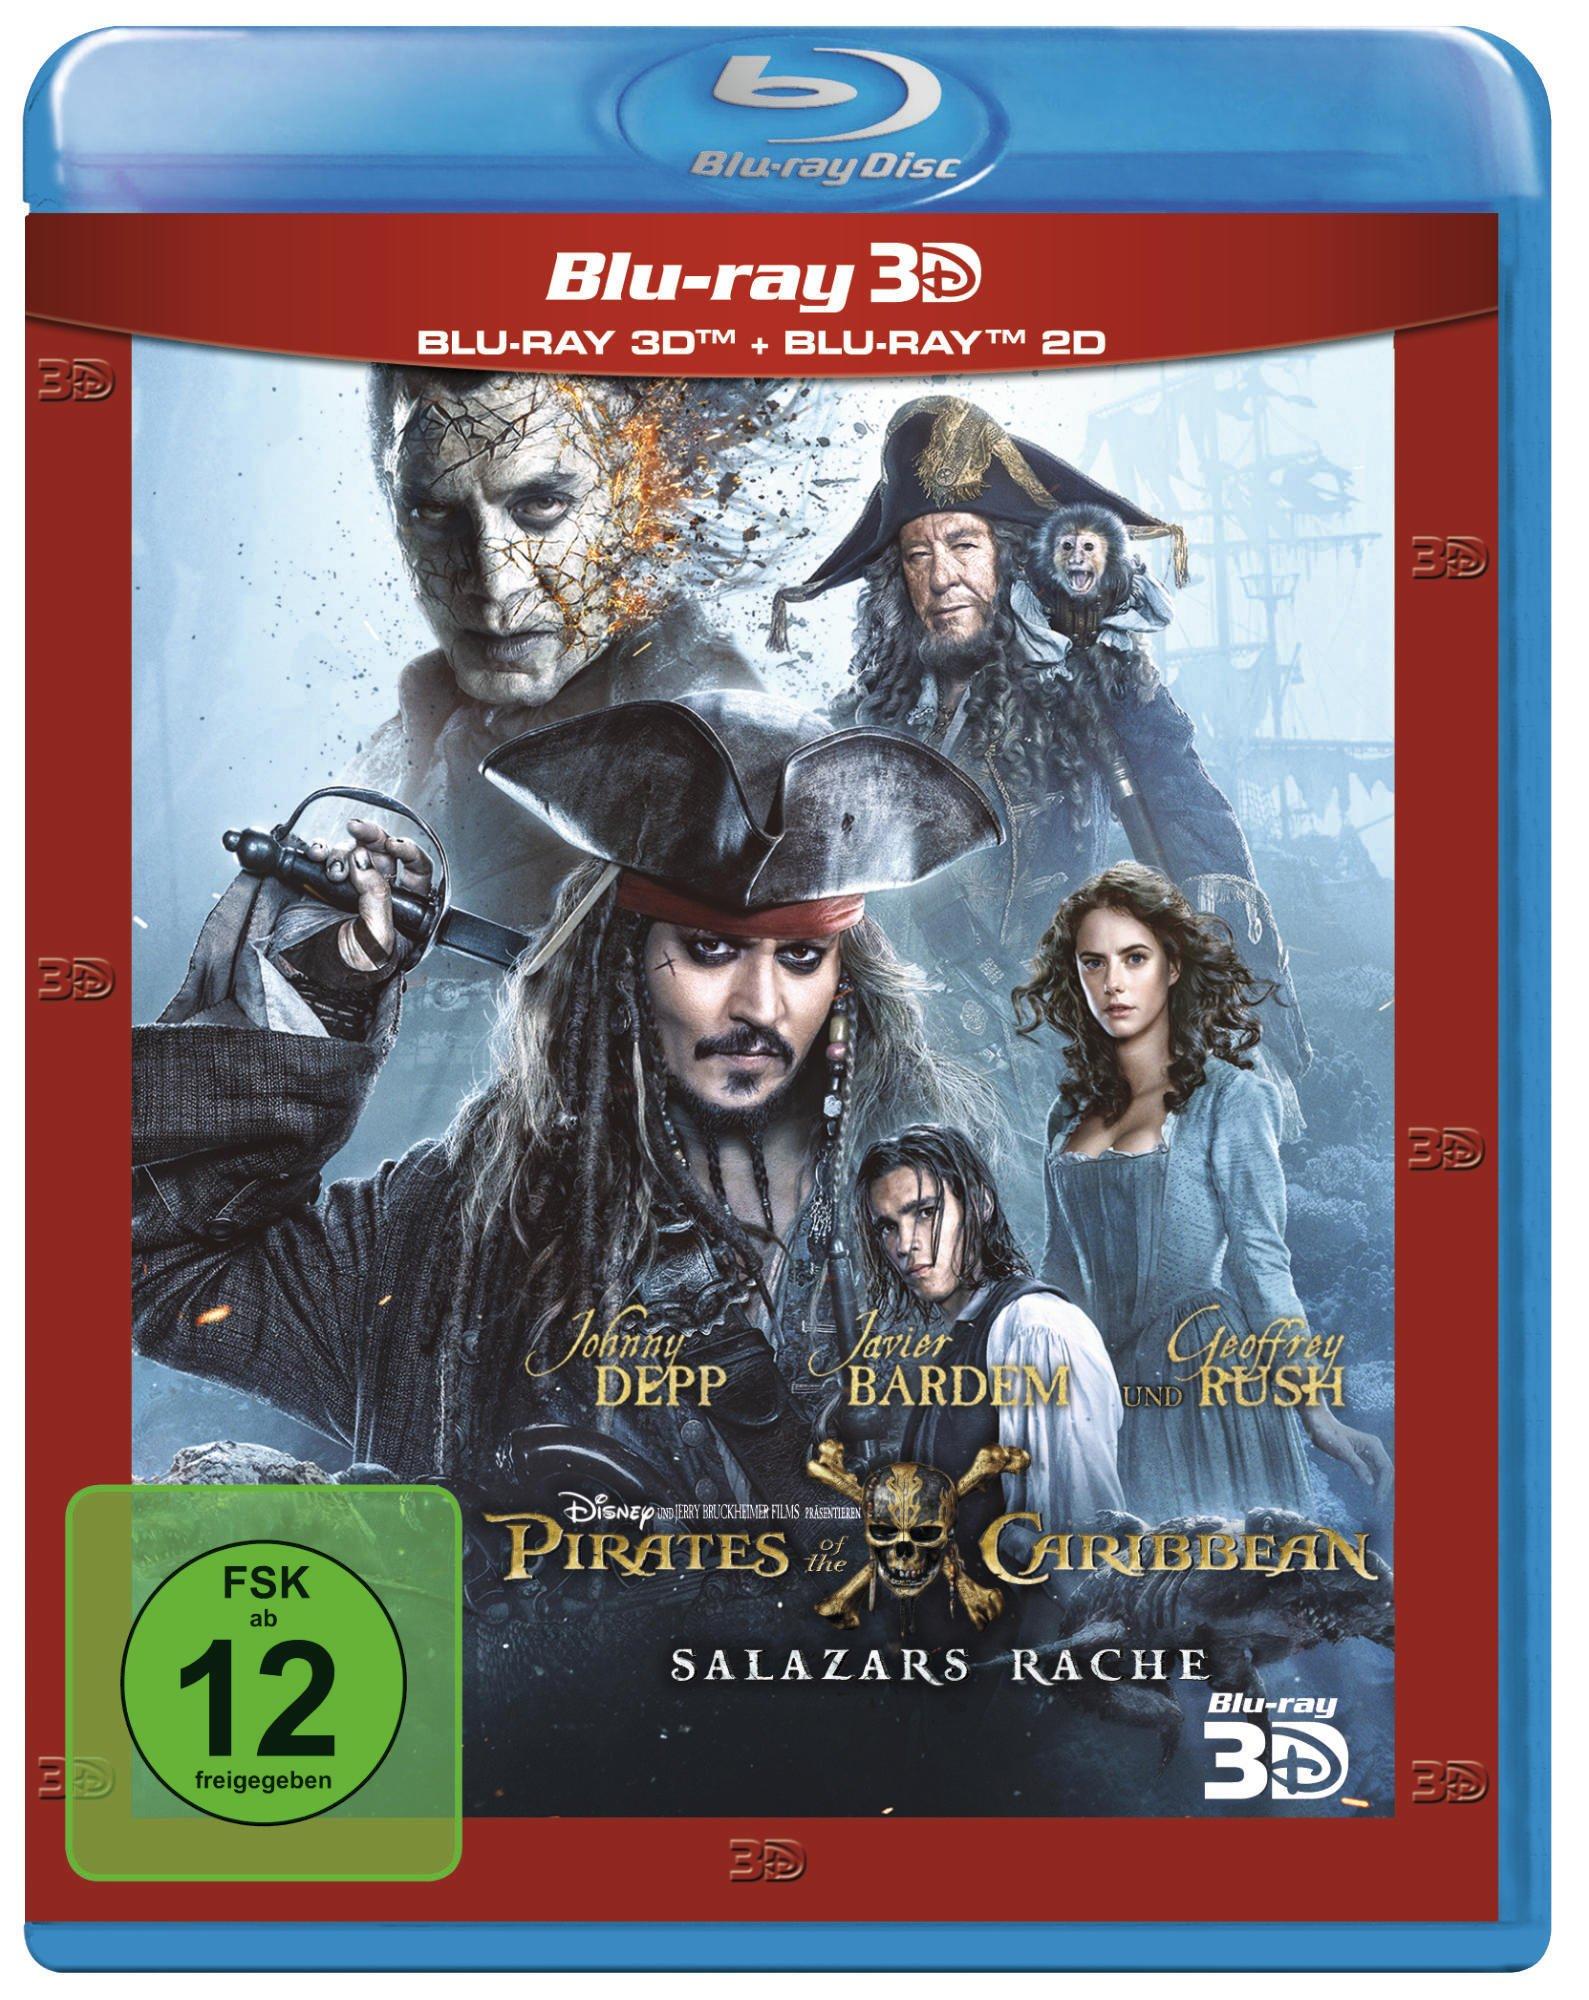 download Pirates.of.the.Caribbean.Salazars.Rache.3D.2017.German.DL.1080p.BluRay.x264-BluRay3D